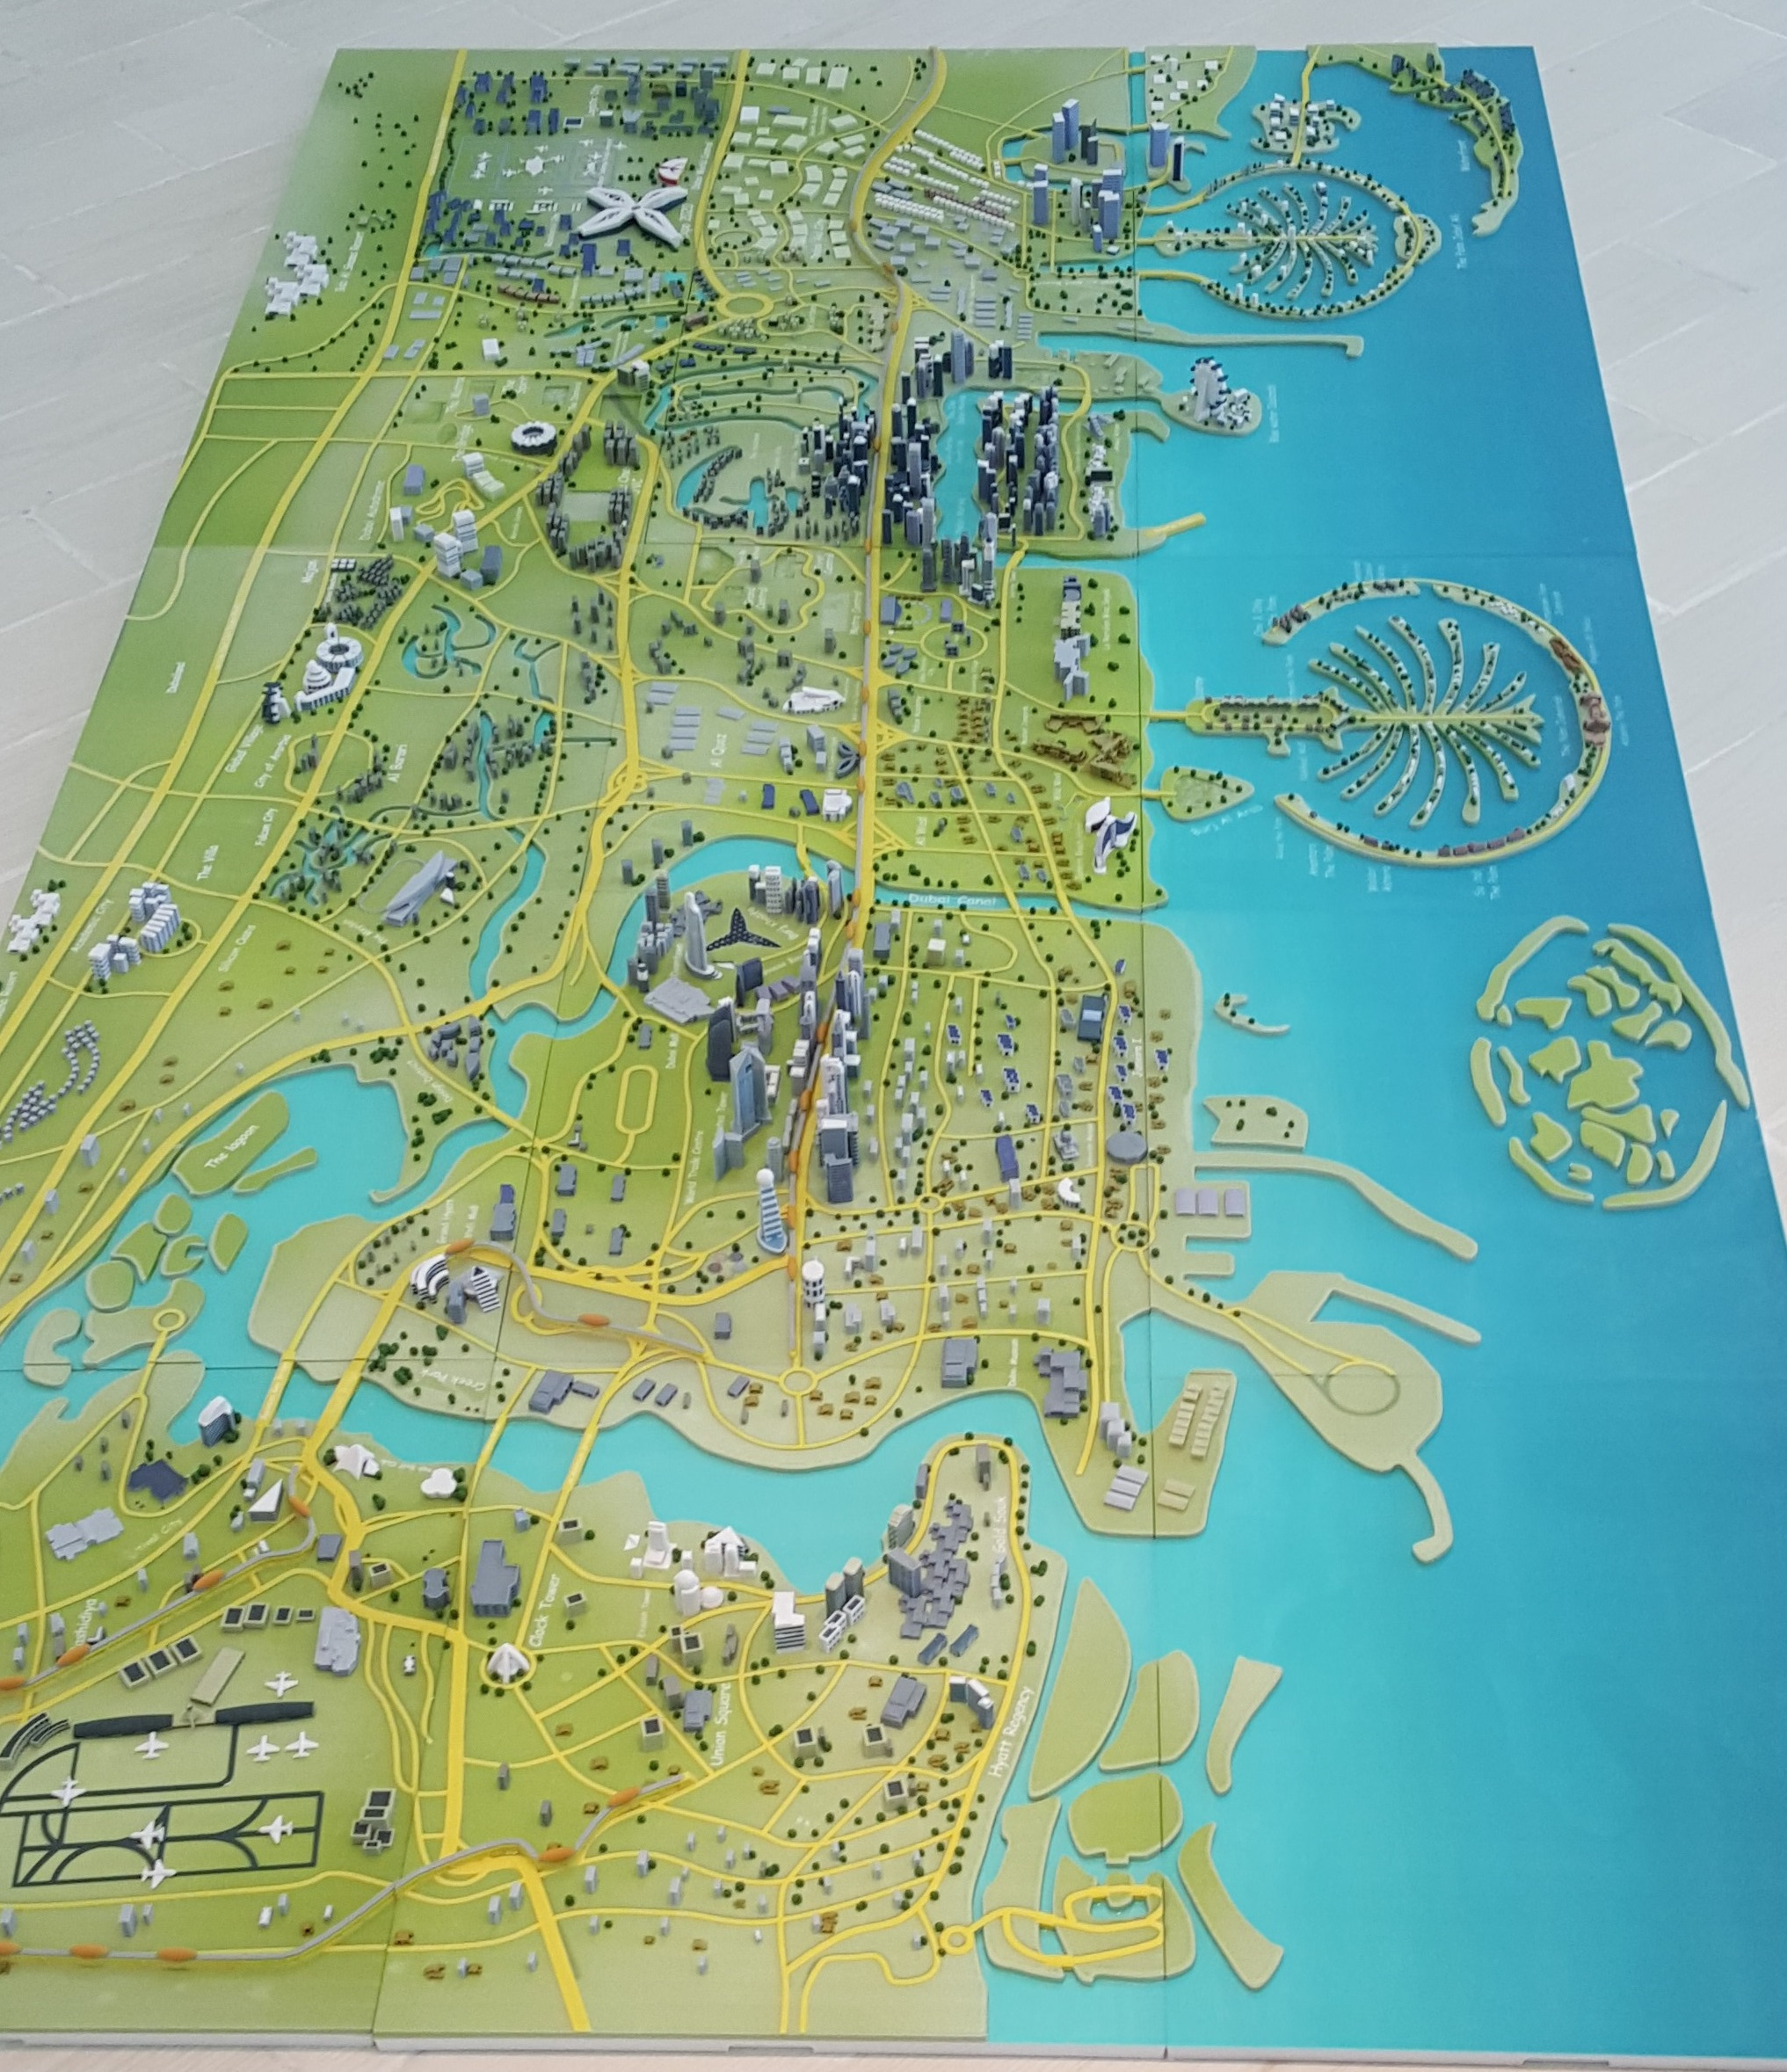 3d printed map dubai color generation 3dgeneration 3d 3d printed map dubai color gumiabroncs Gallery